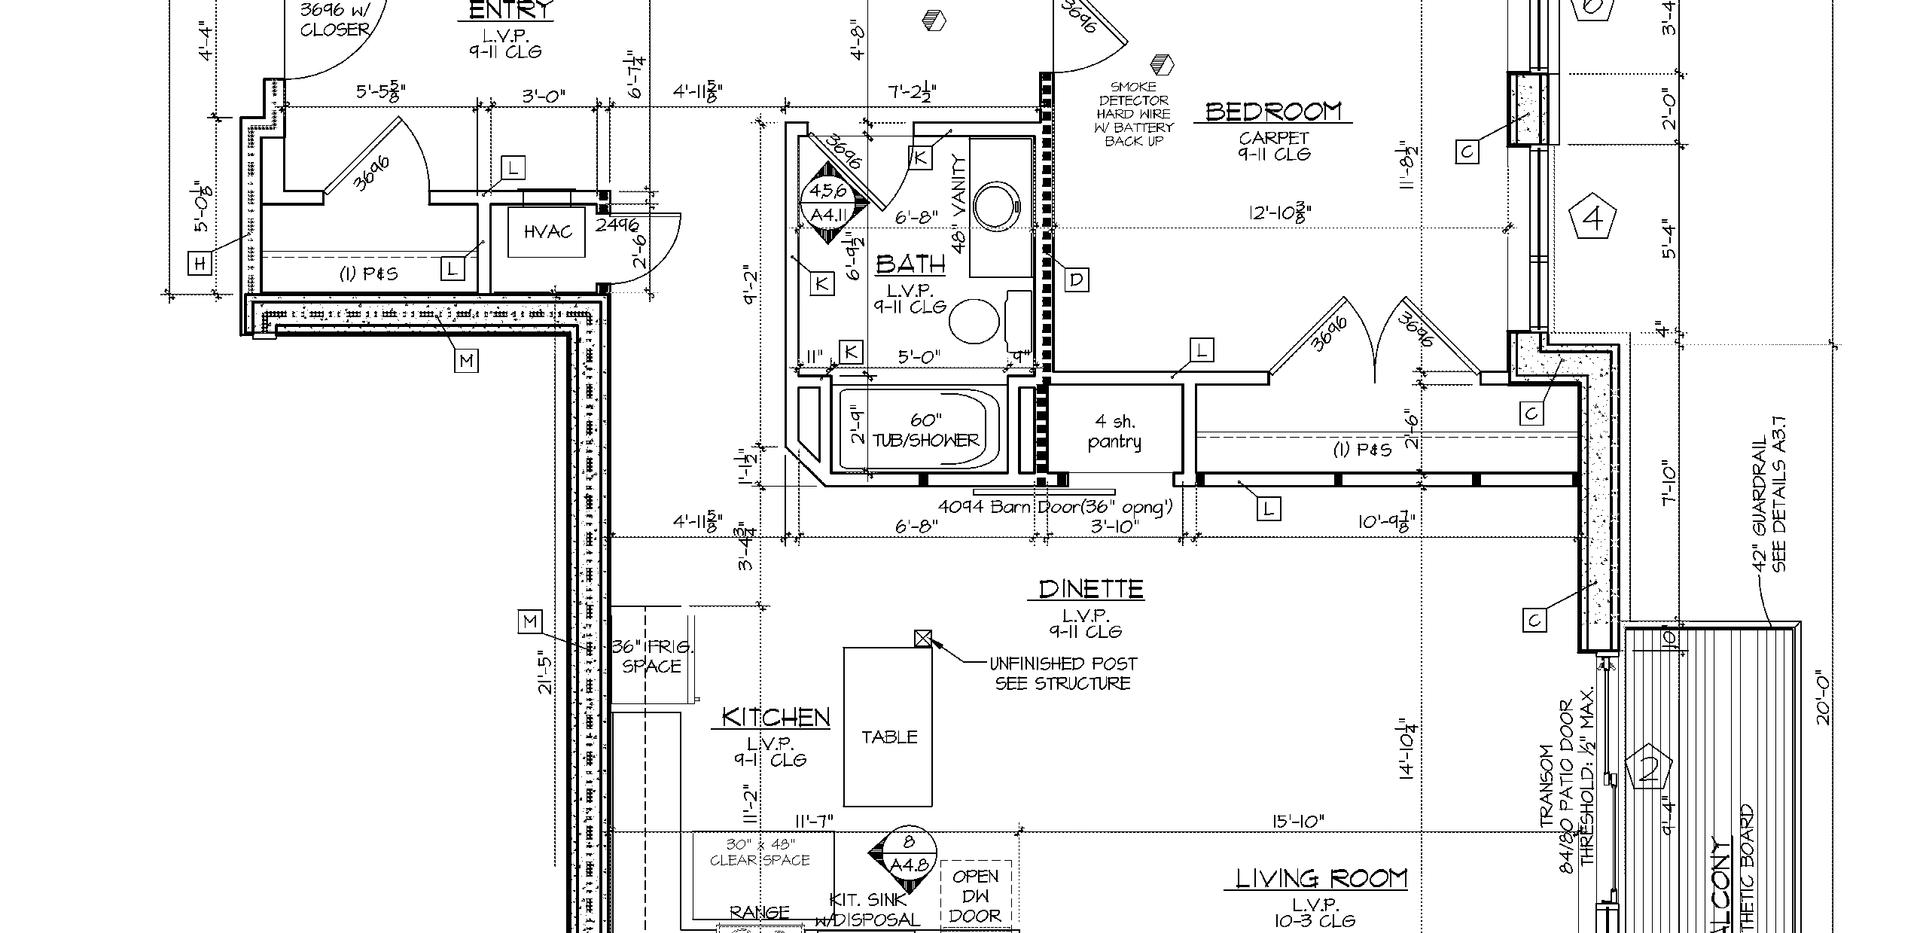 Manseau Falts - Unit Plan - X05.png